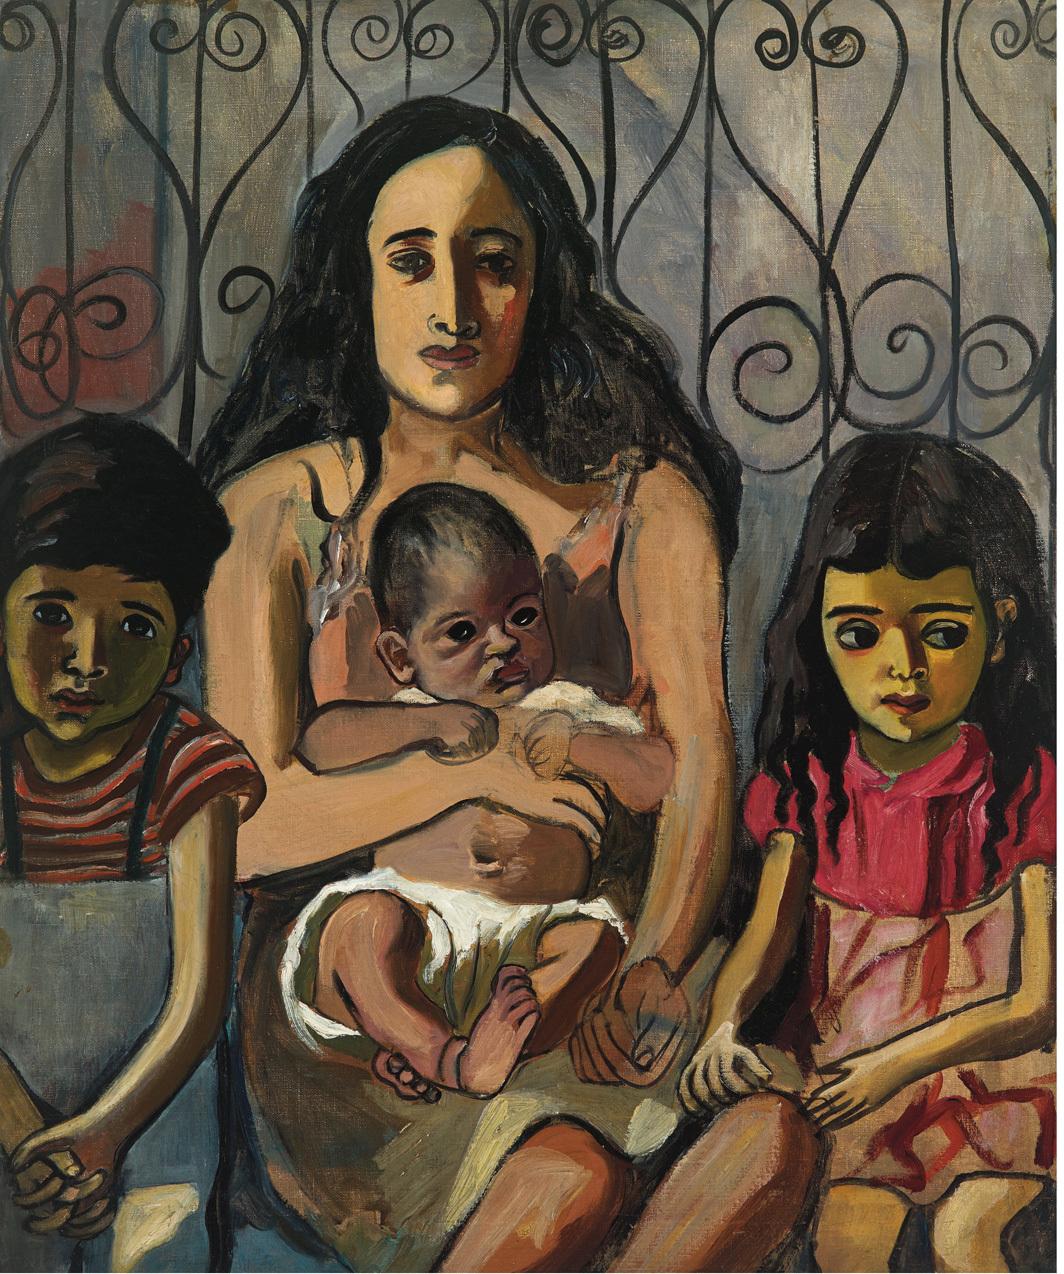 Alice Neel, The Spanish Family, 1943, oil on canvas, 34 × 28